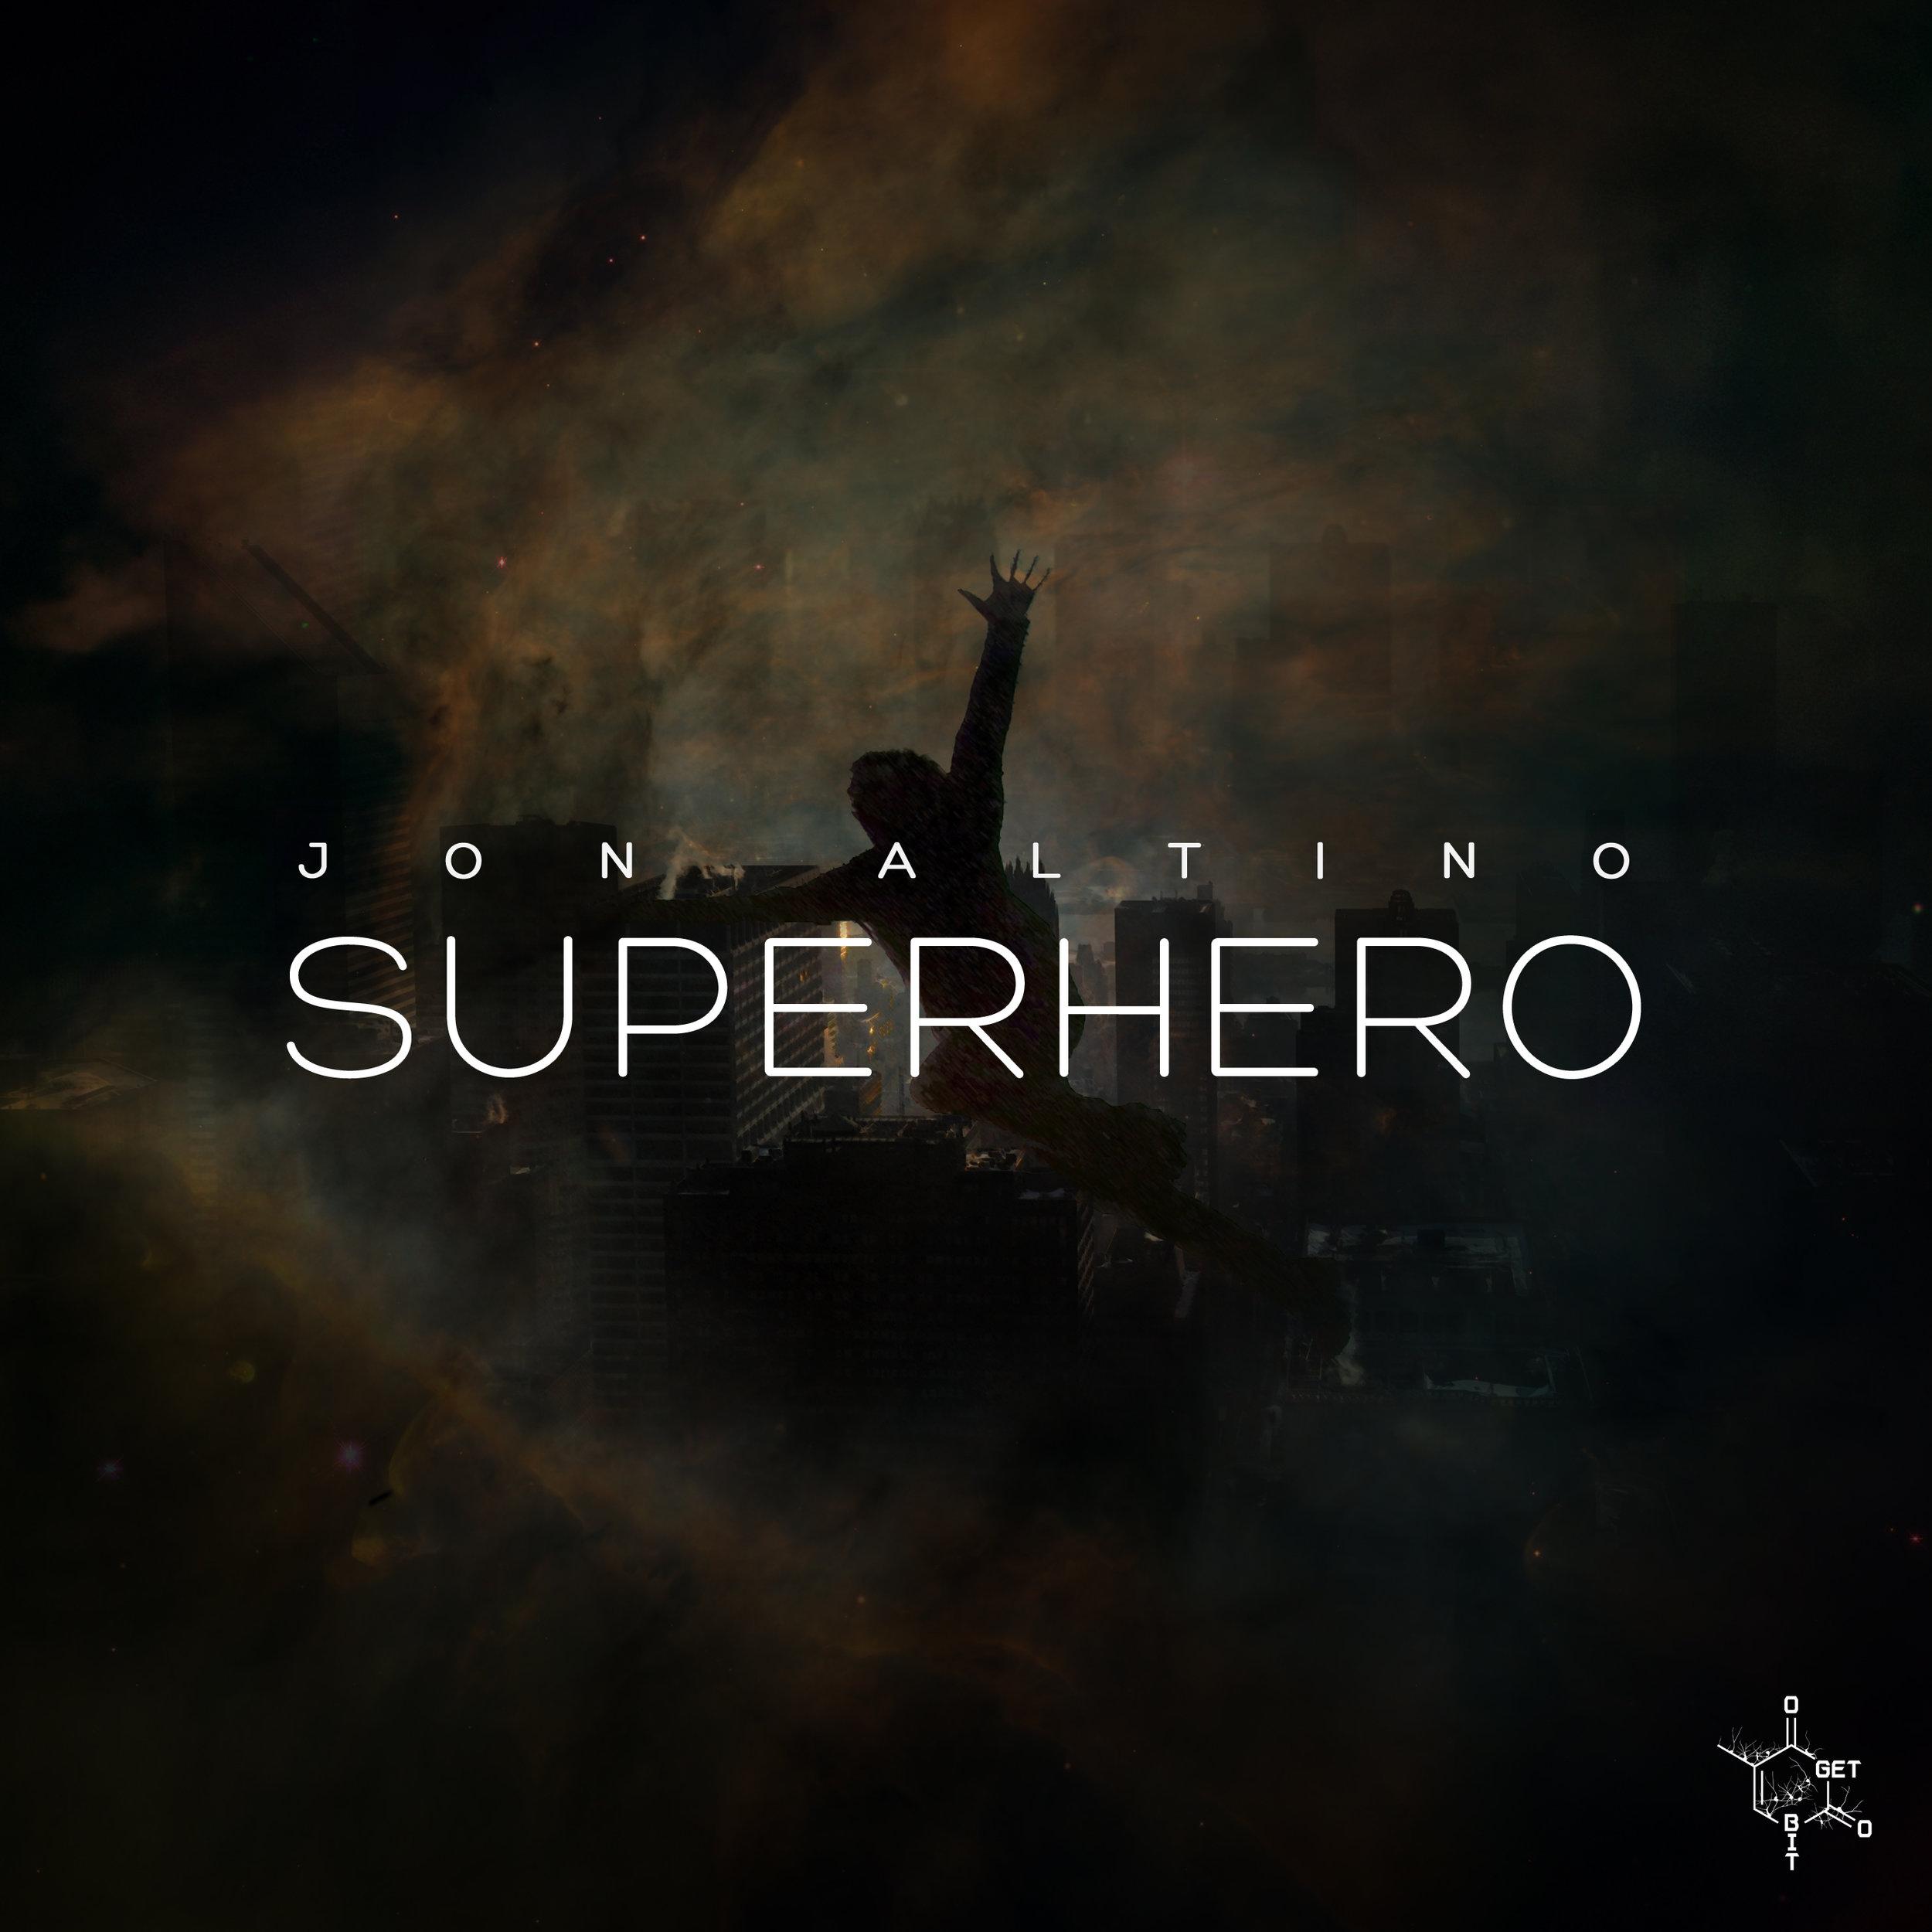 Superhero_Cover_2700.jpg